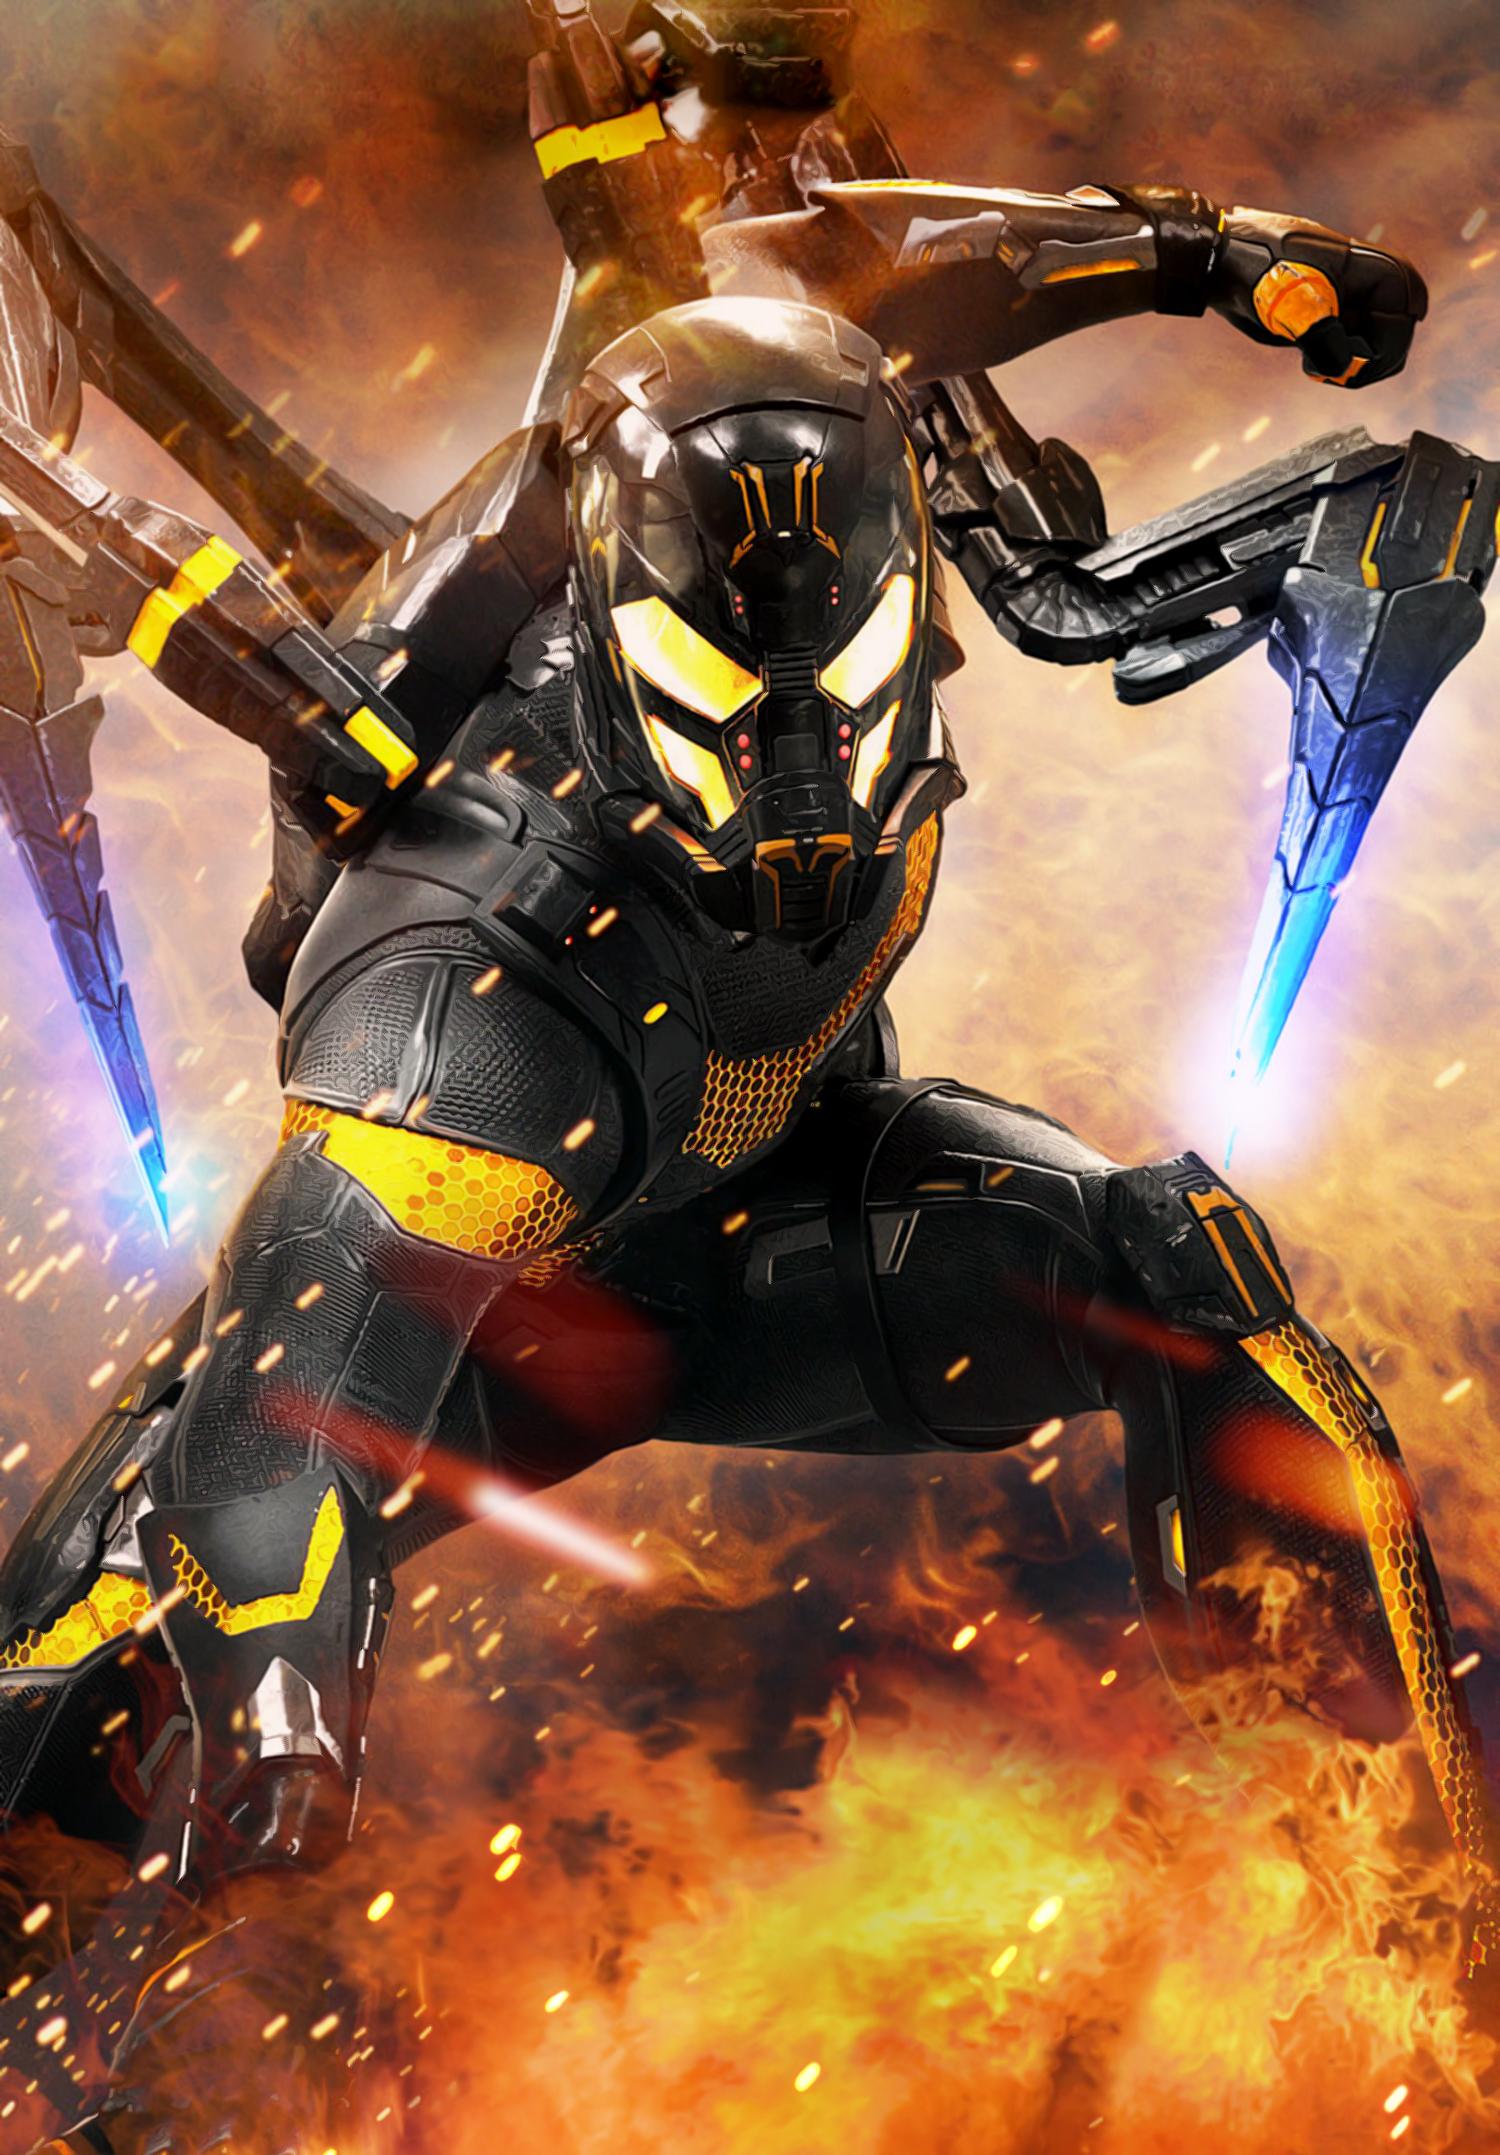 Yellow jacket - Yellowjacket Marvel Cinematic Universe Wiki Fandom Powered By Wikia